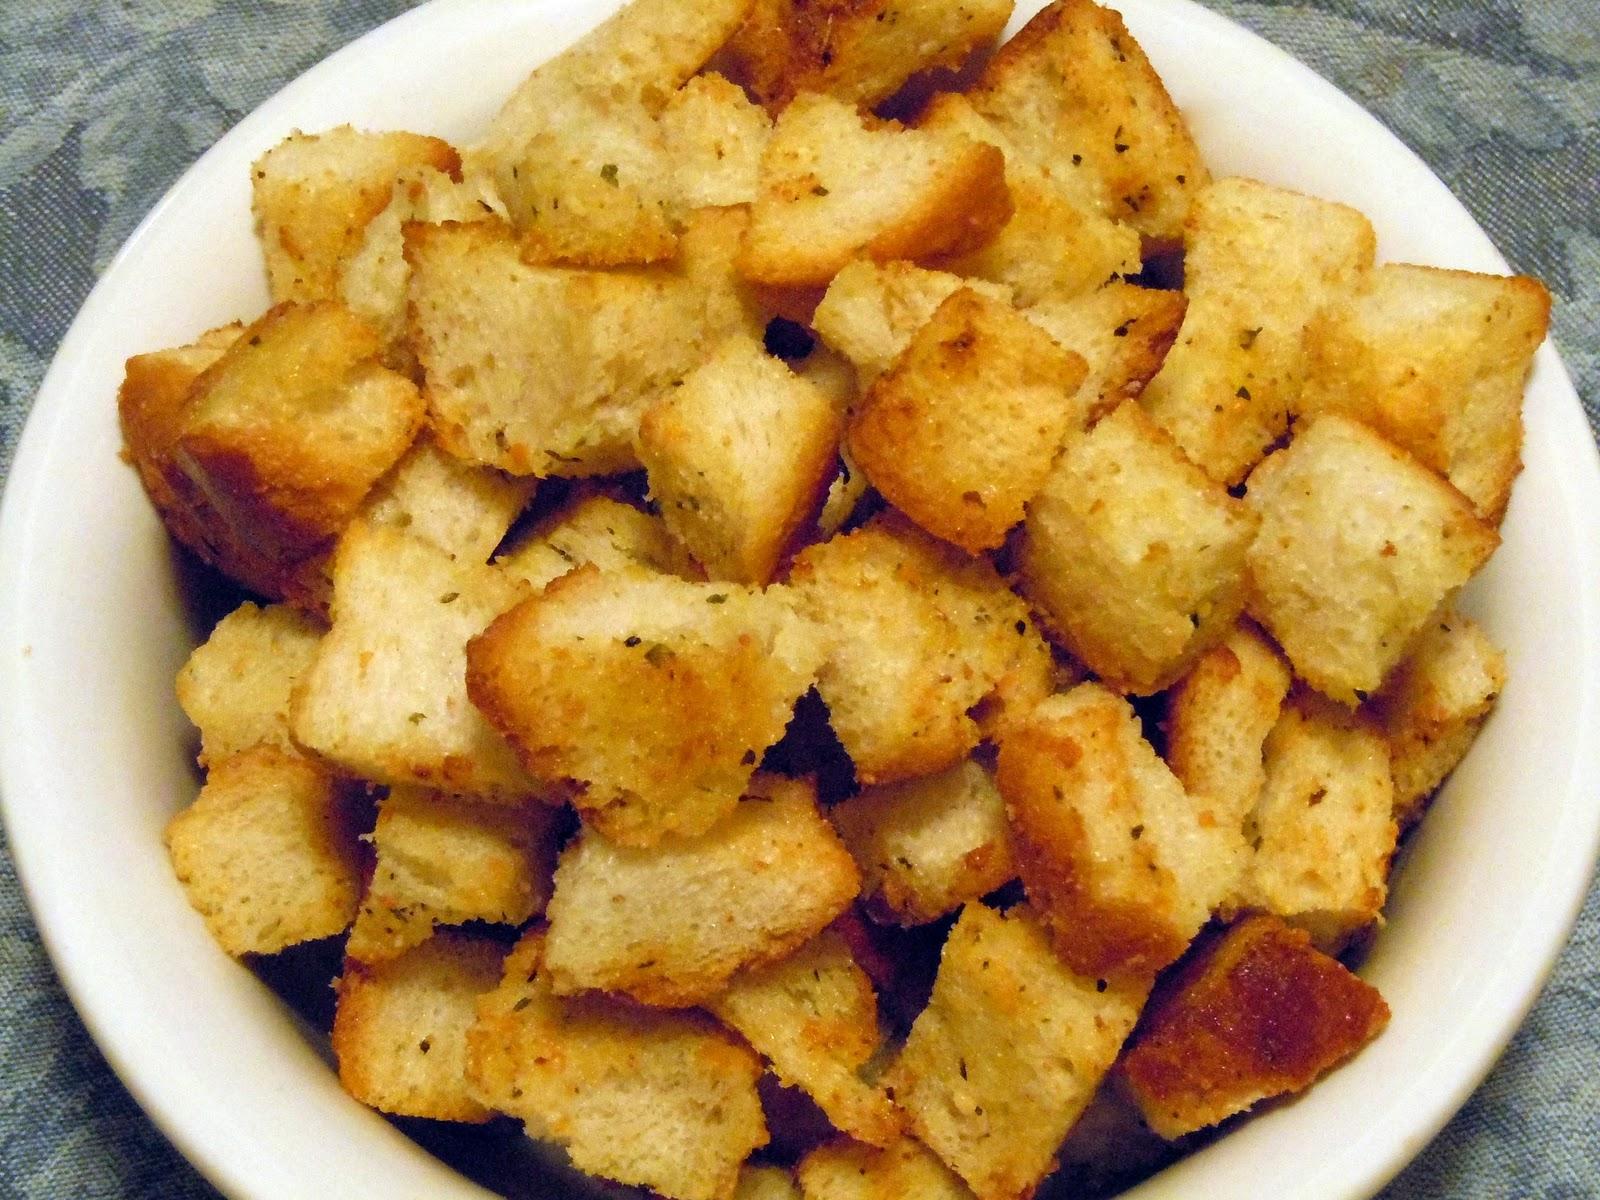 T rminos de cocina croutons juan raro for Terminos de cocina